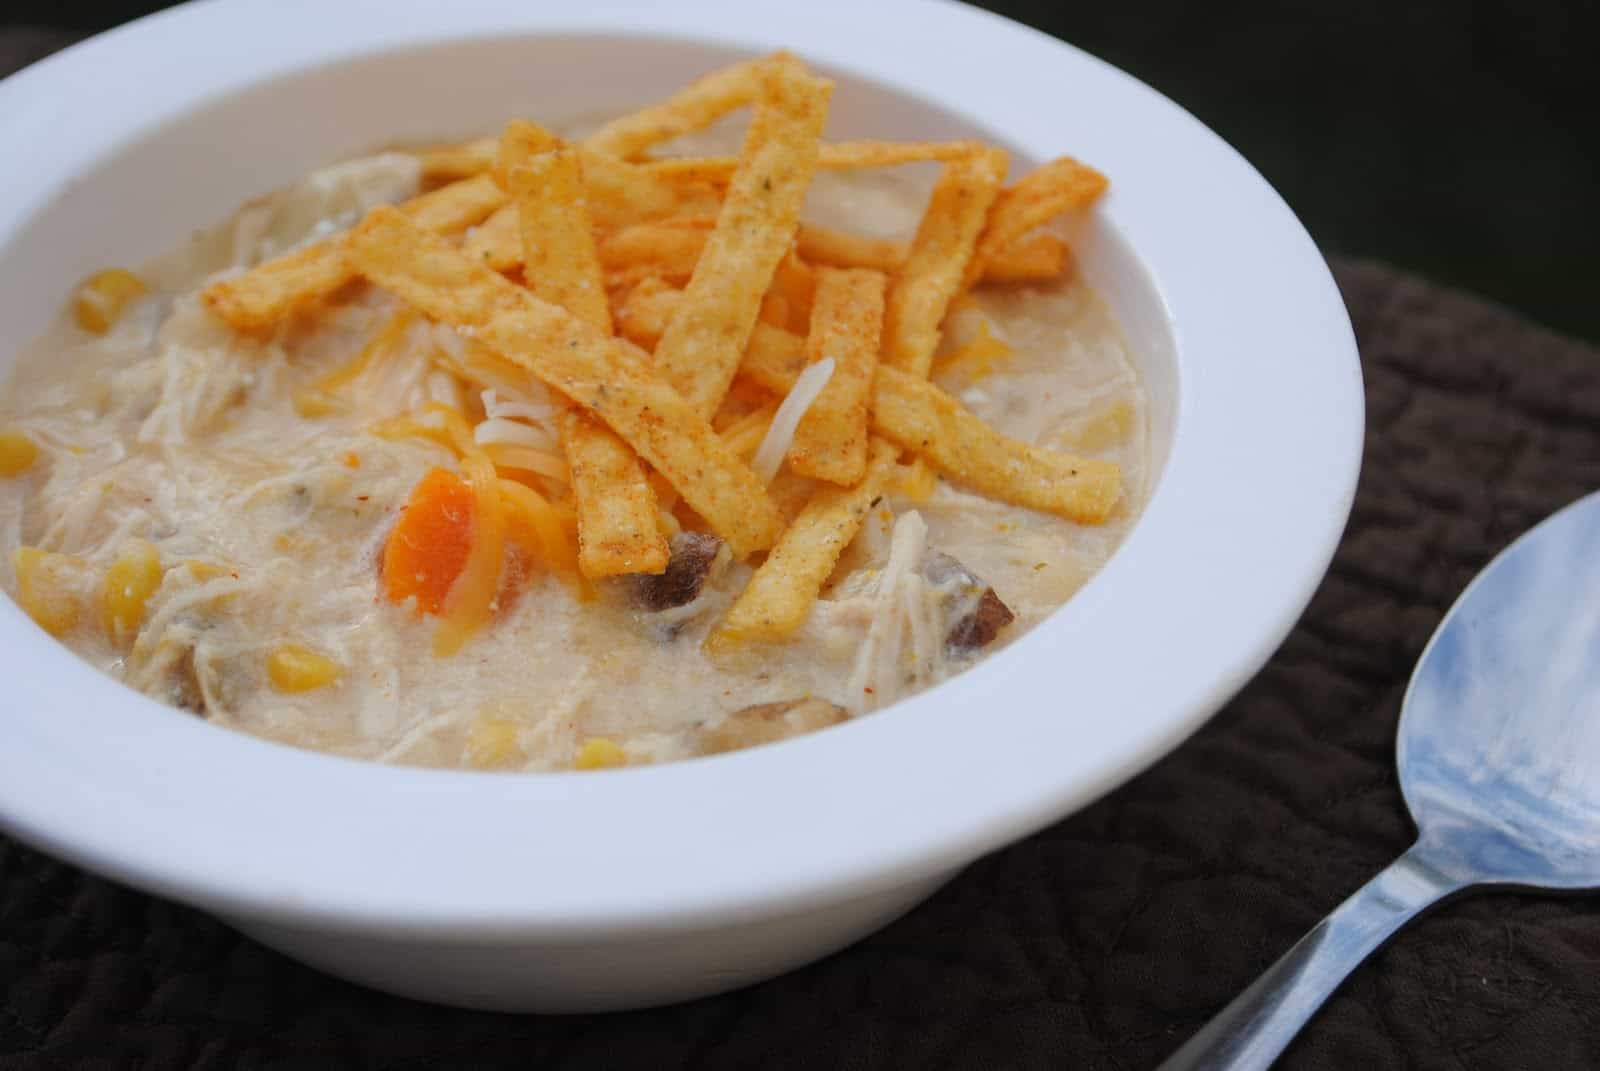 Chicken, Corn and Potato Chowder - Shugary Sweets